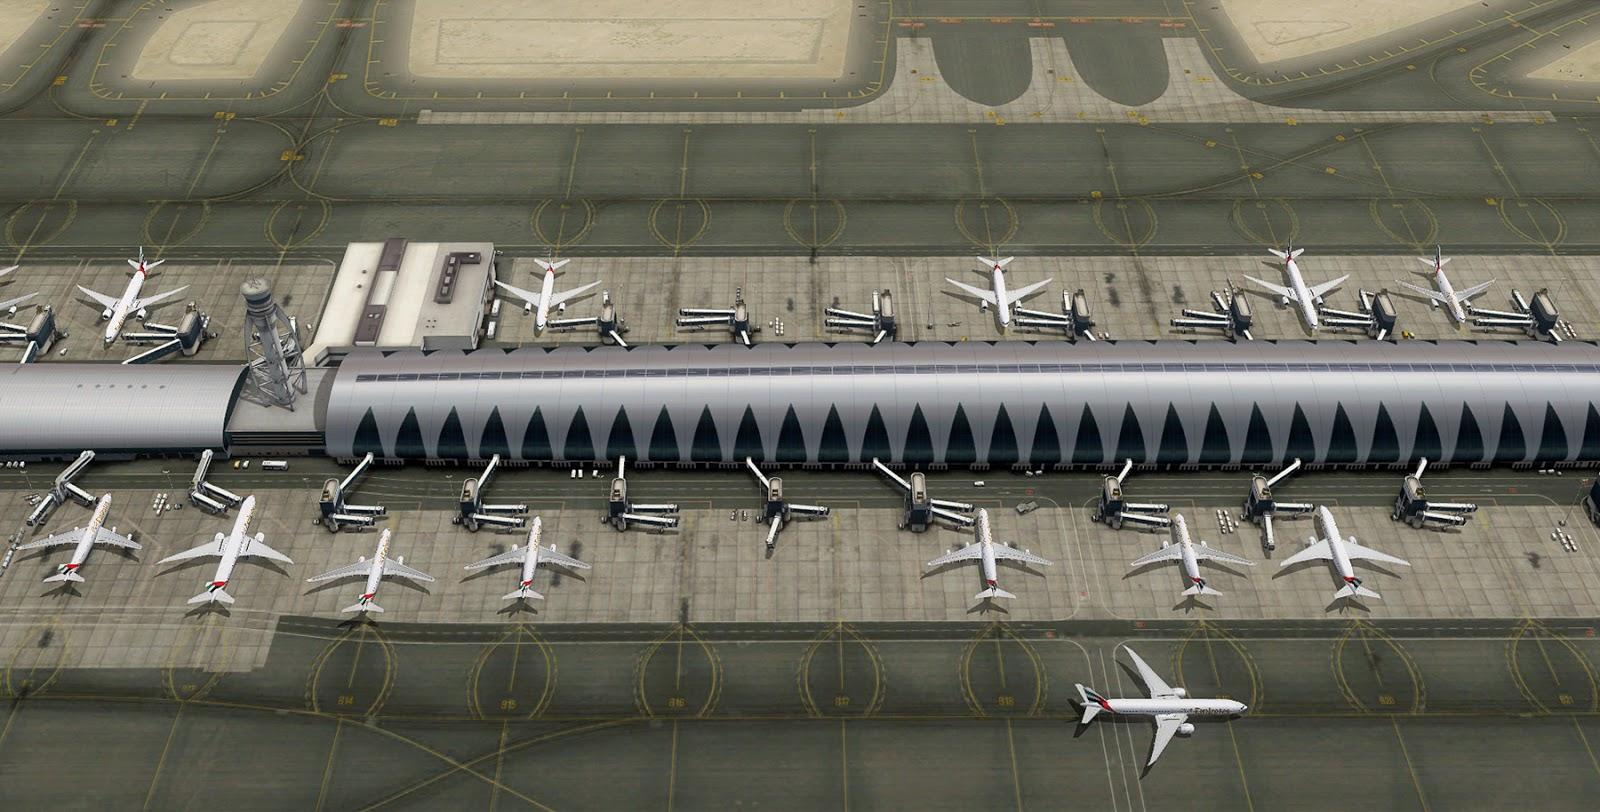 Flytampa Dubai Rebooted Fsx P3d 2017 - forumgoo